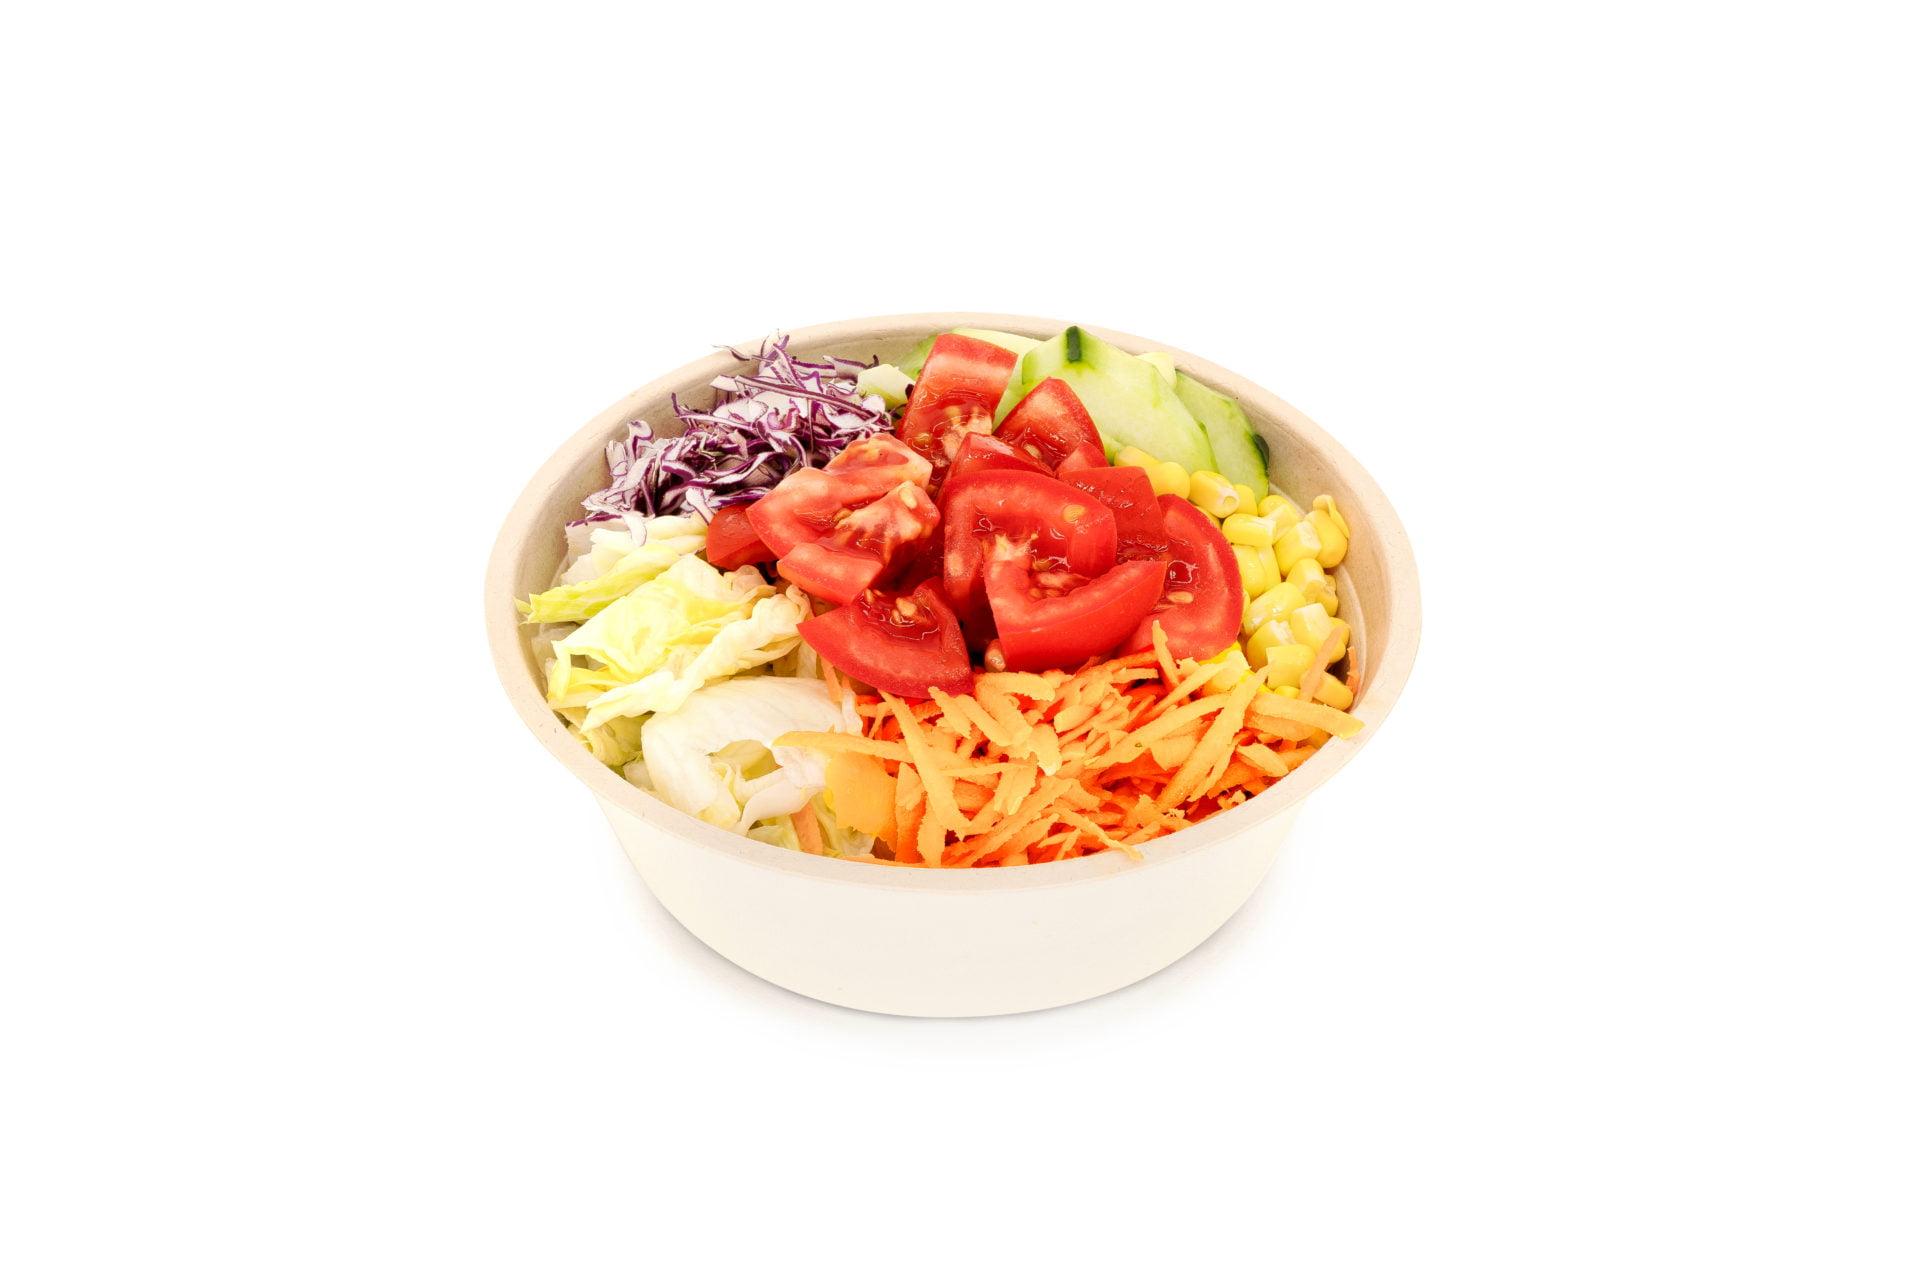 Best Pizza gemischter Salat